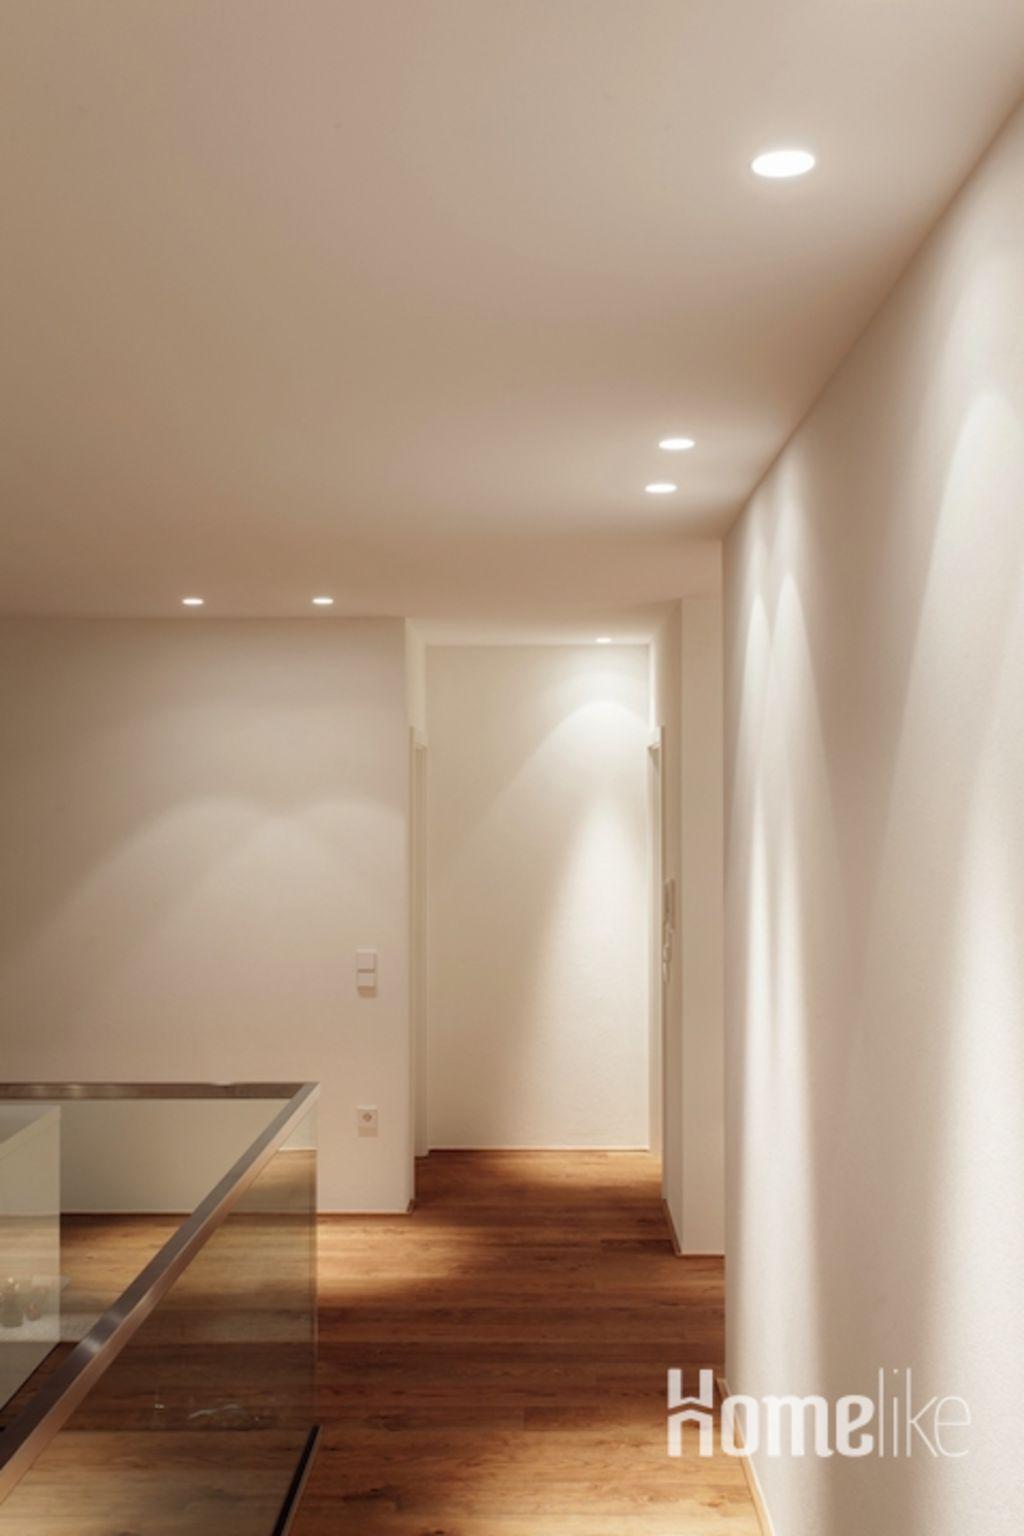 image 9 furnished 2 bedroom Apartment for rent in Karlsruhe, Baden-Wurttemberg